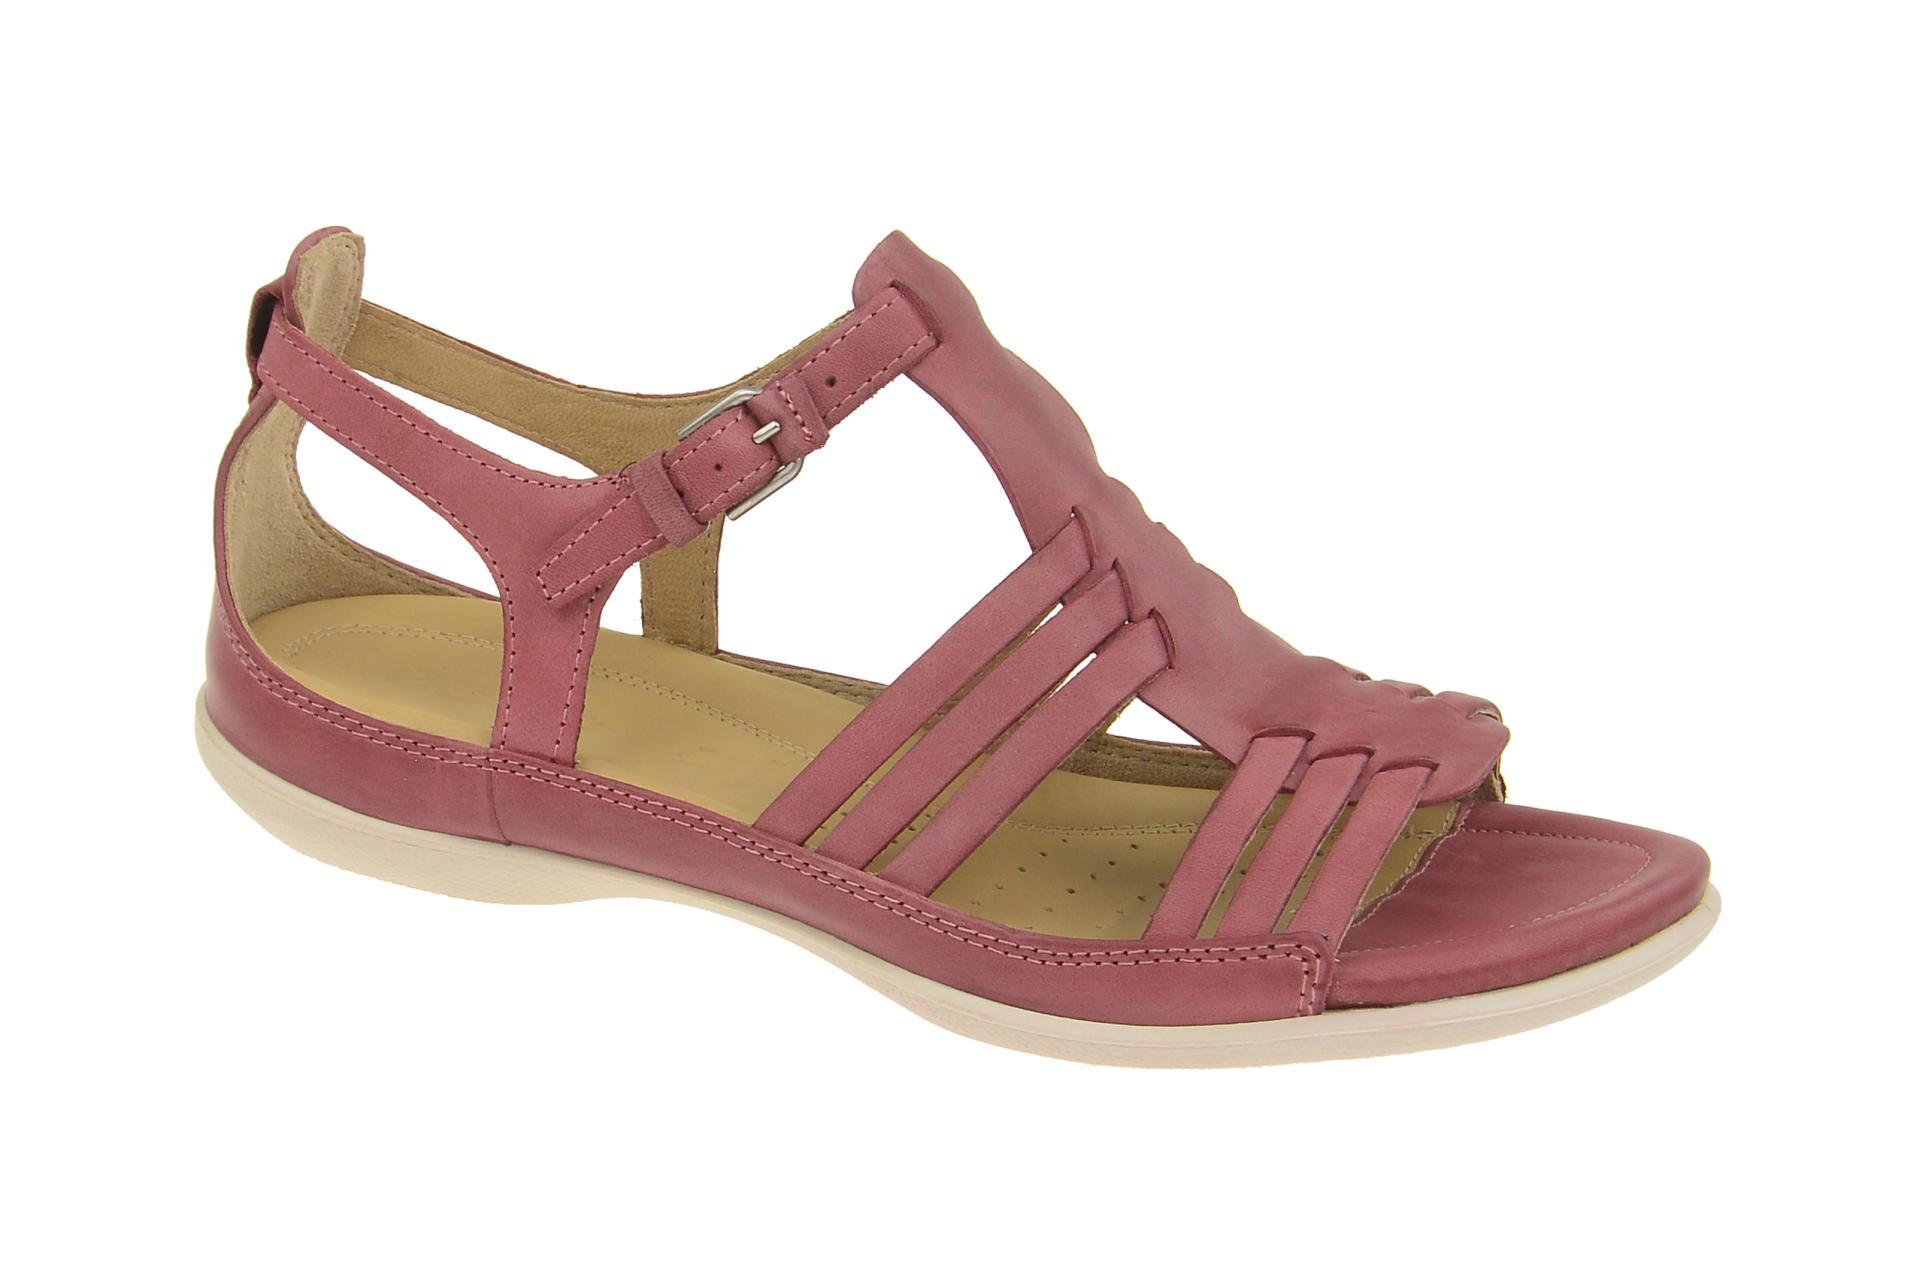 ecco damen sandalette riemchen sandalen flash rot petal. Black Bedroom Furniture Sets. Home Design Ideas